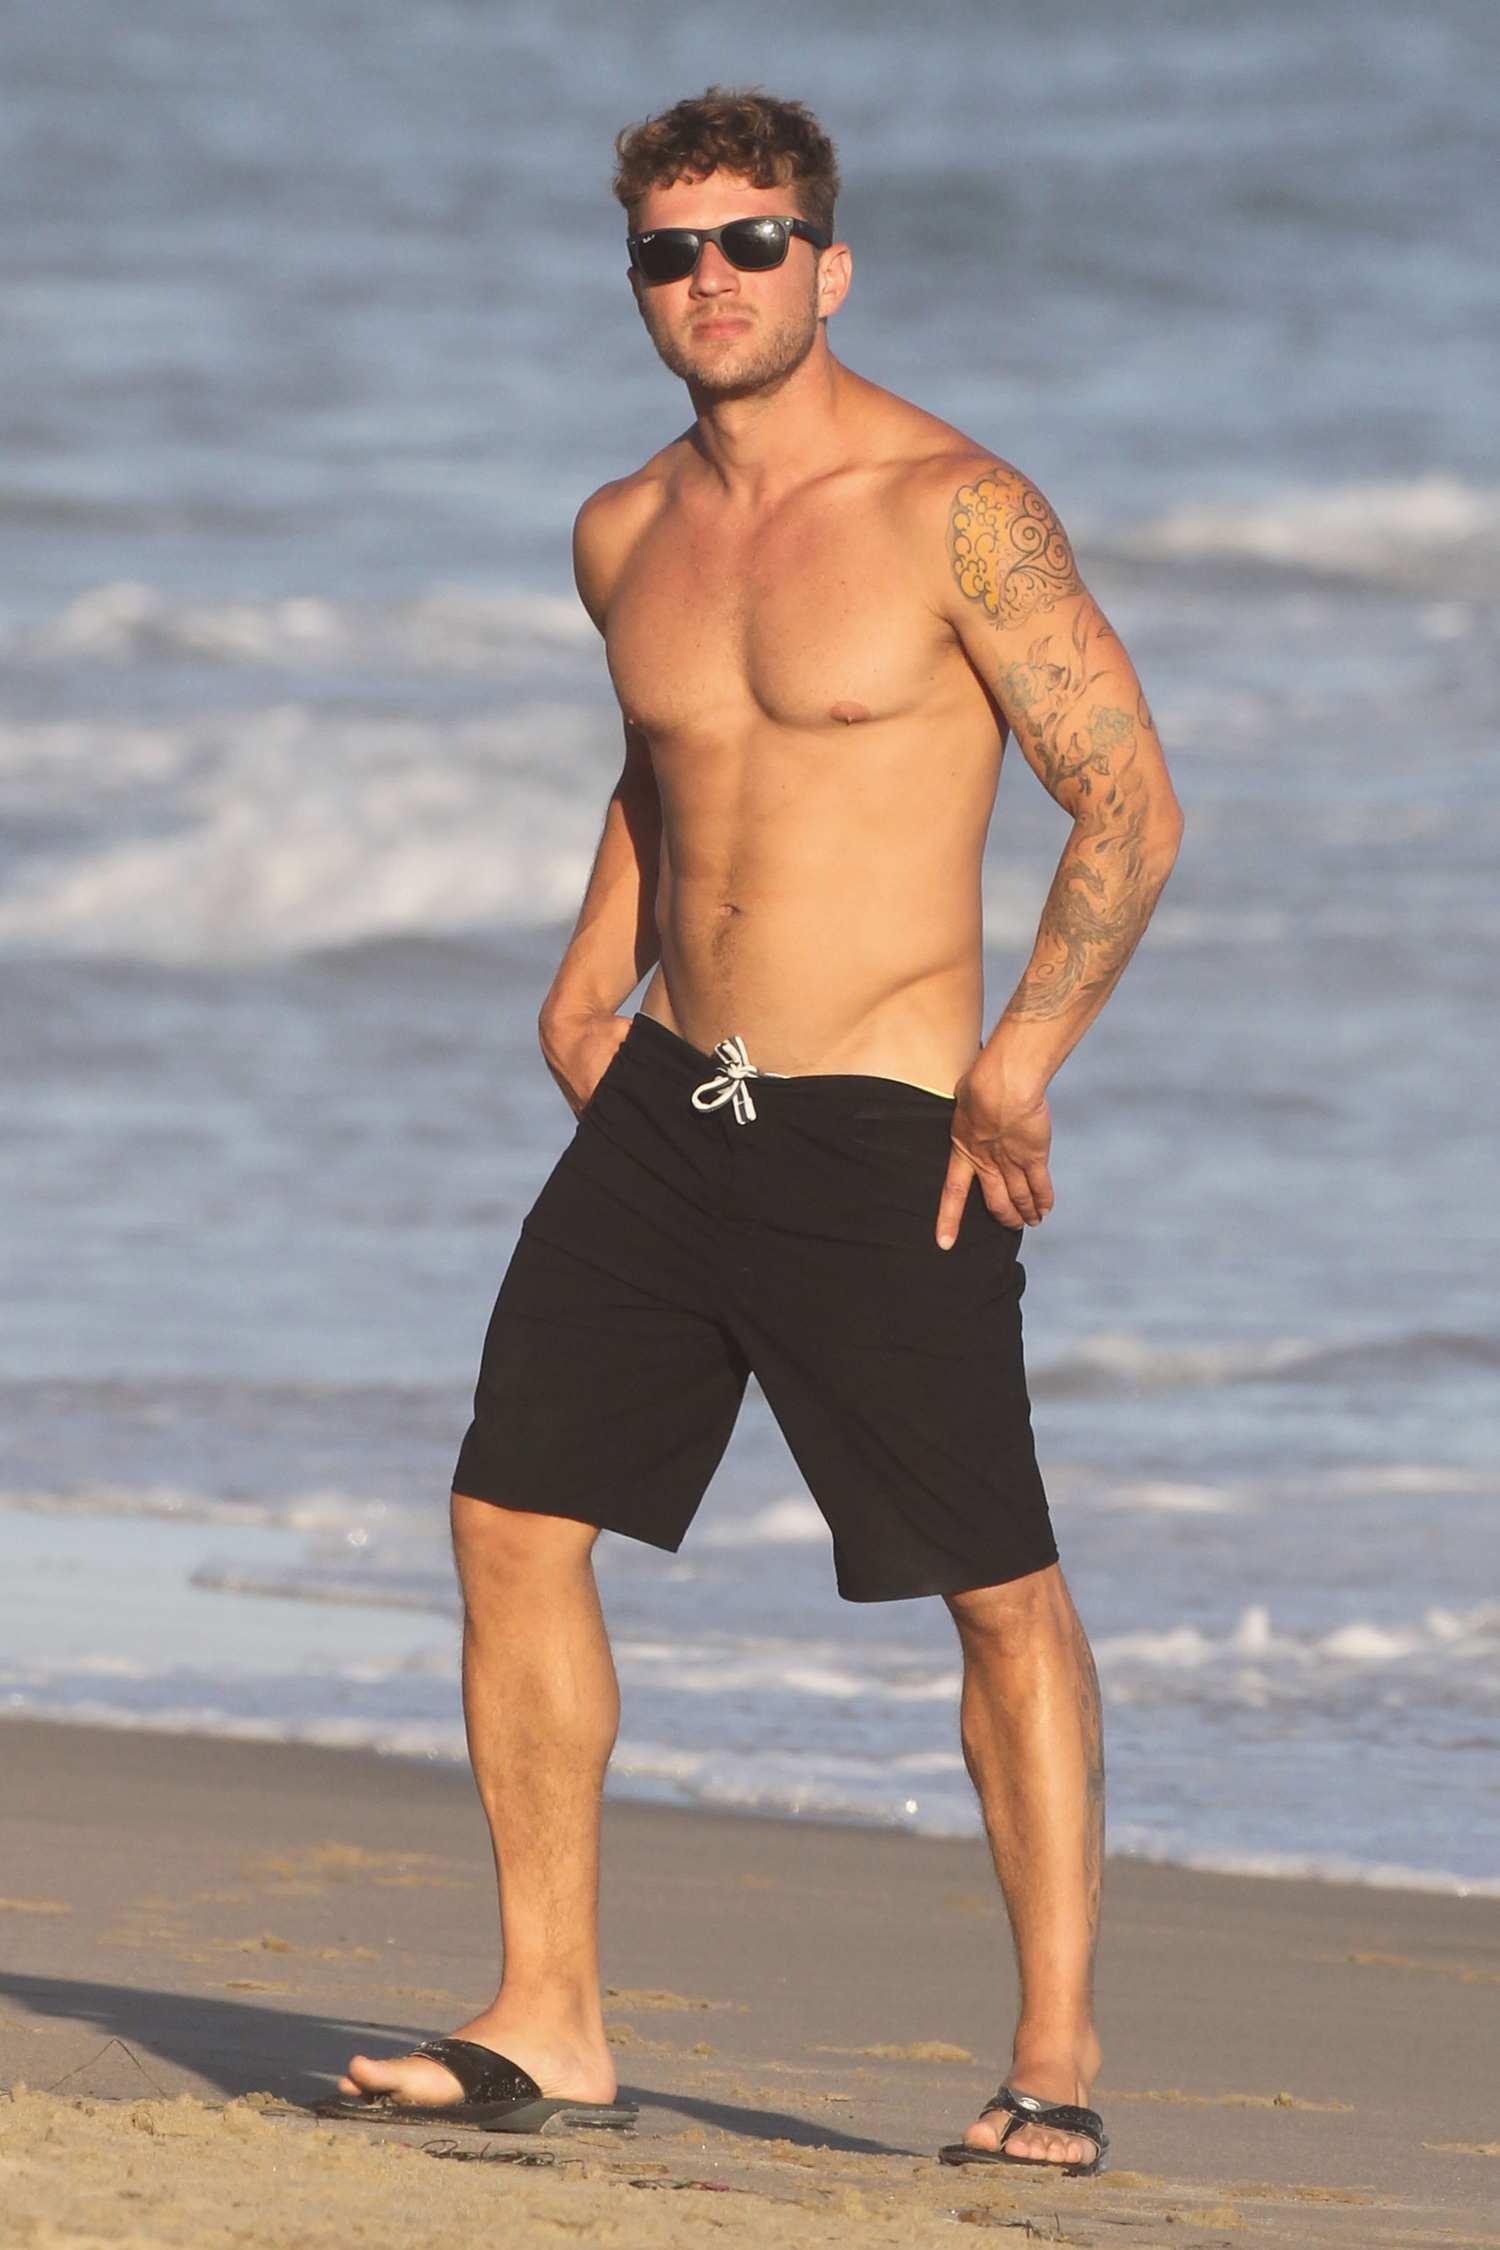 Ryan Phillippe Shows Off His Physique Body in Malibu – Celeb Donut Ryan Phillippe